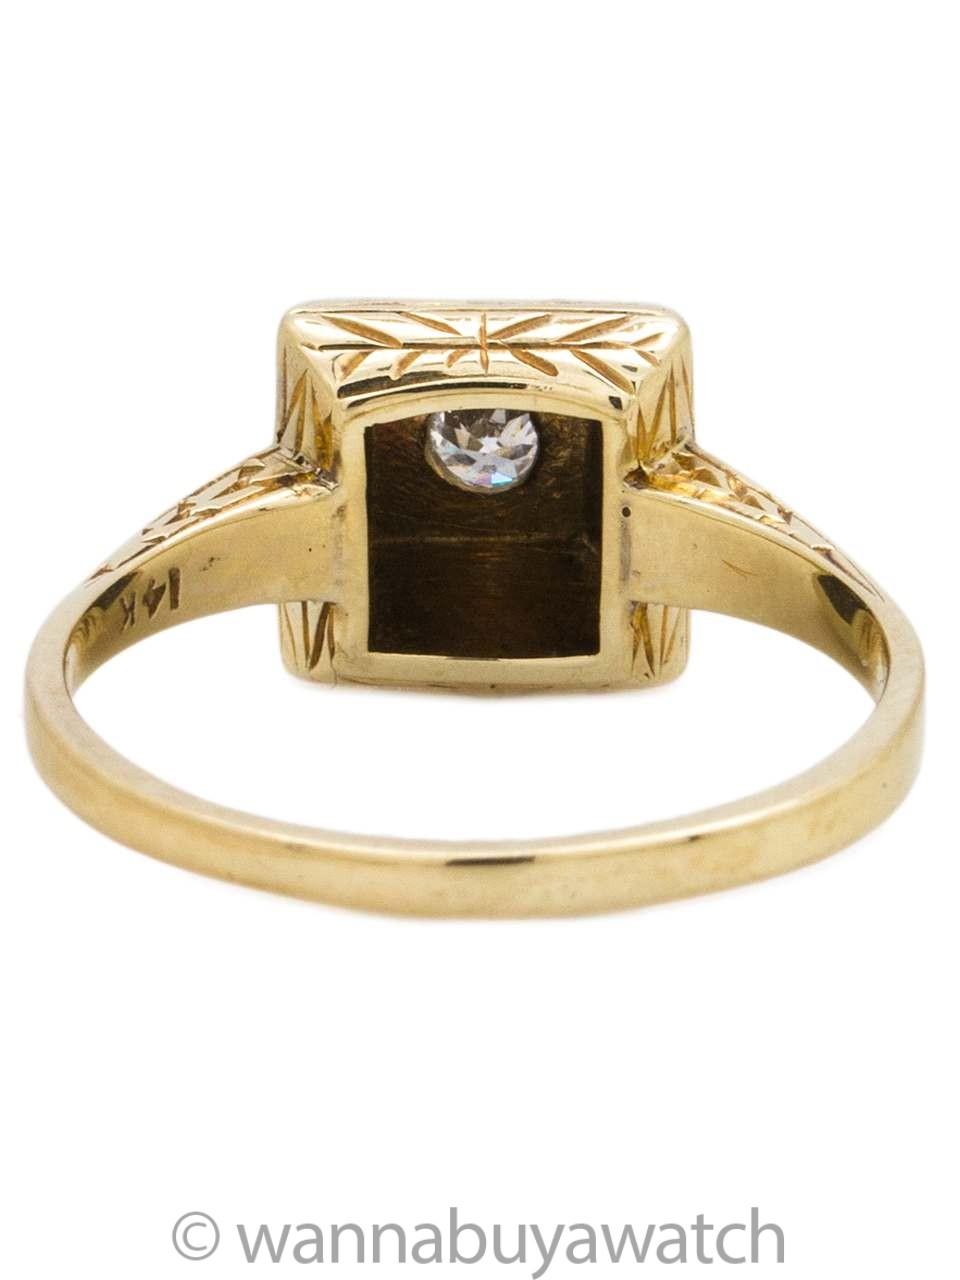 Vintage Engagement Ring 14K 0.10ct OEC J-I2 circa 1920s